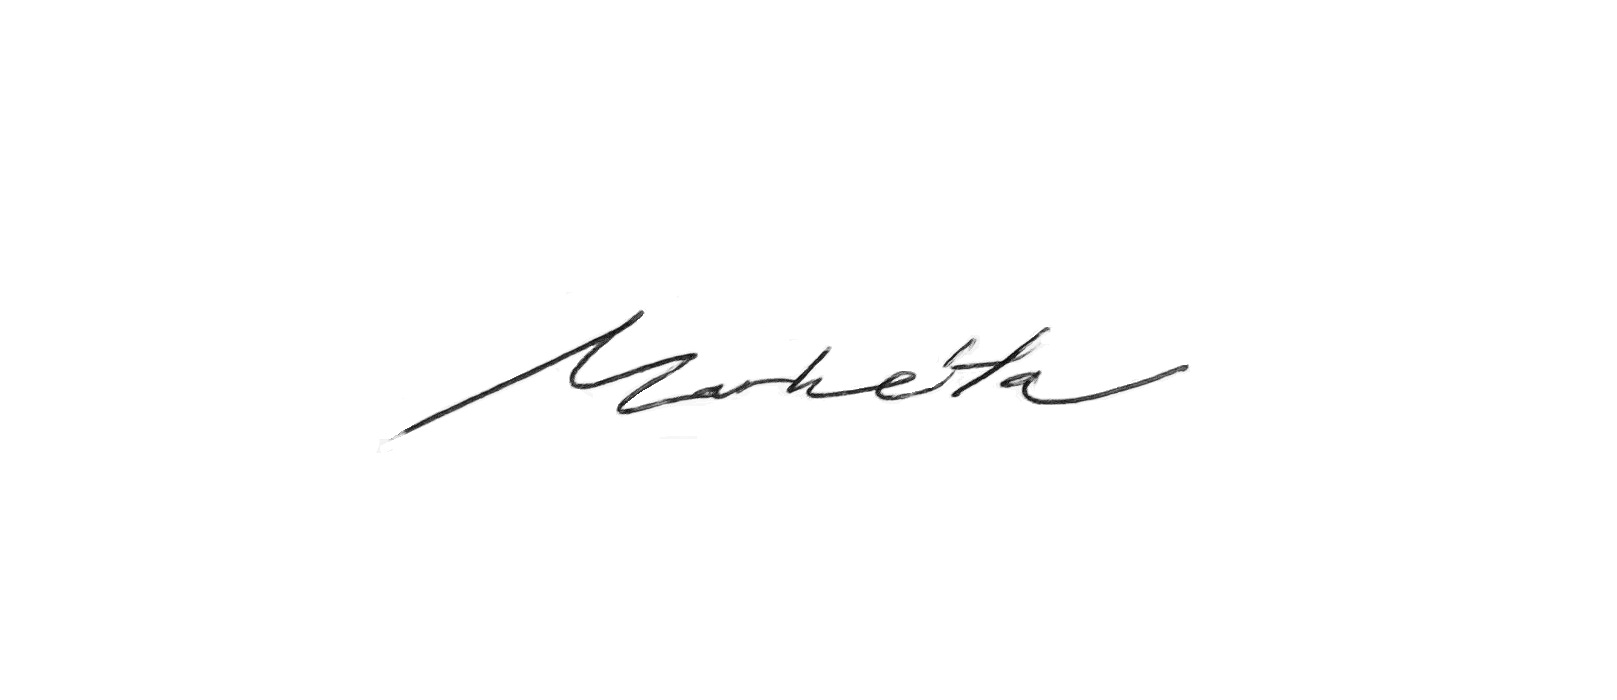 Markéta Svobodová's Signature